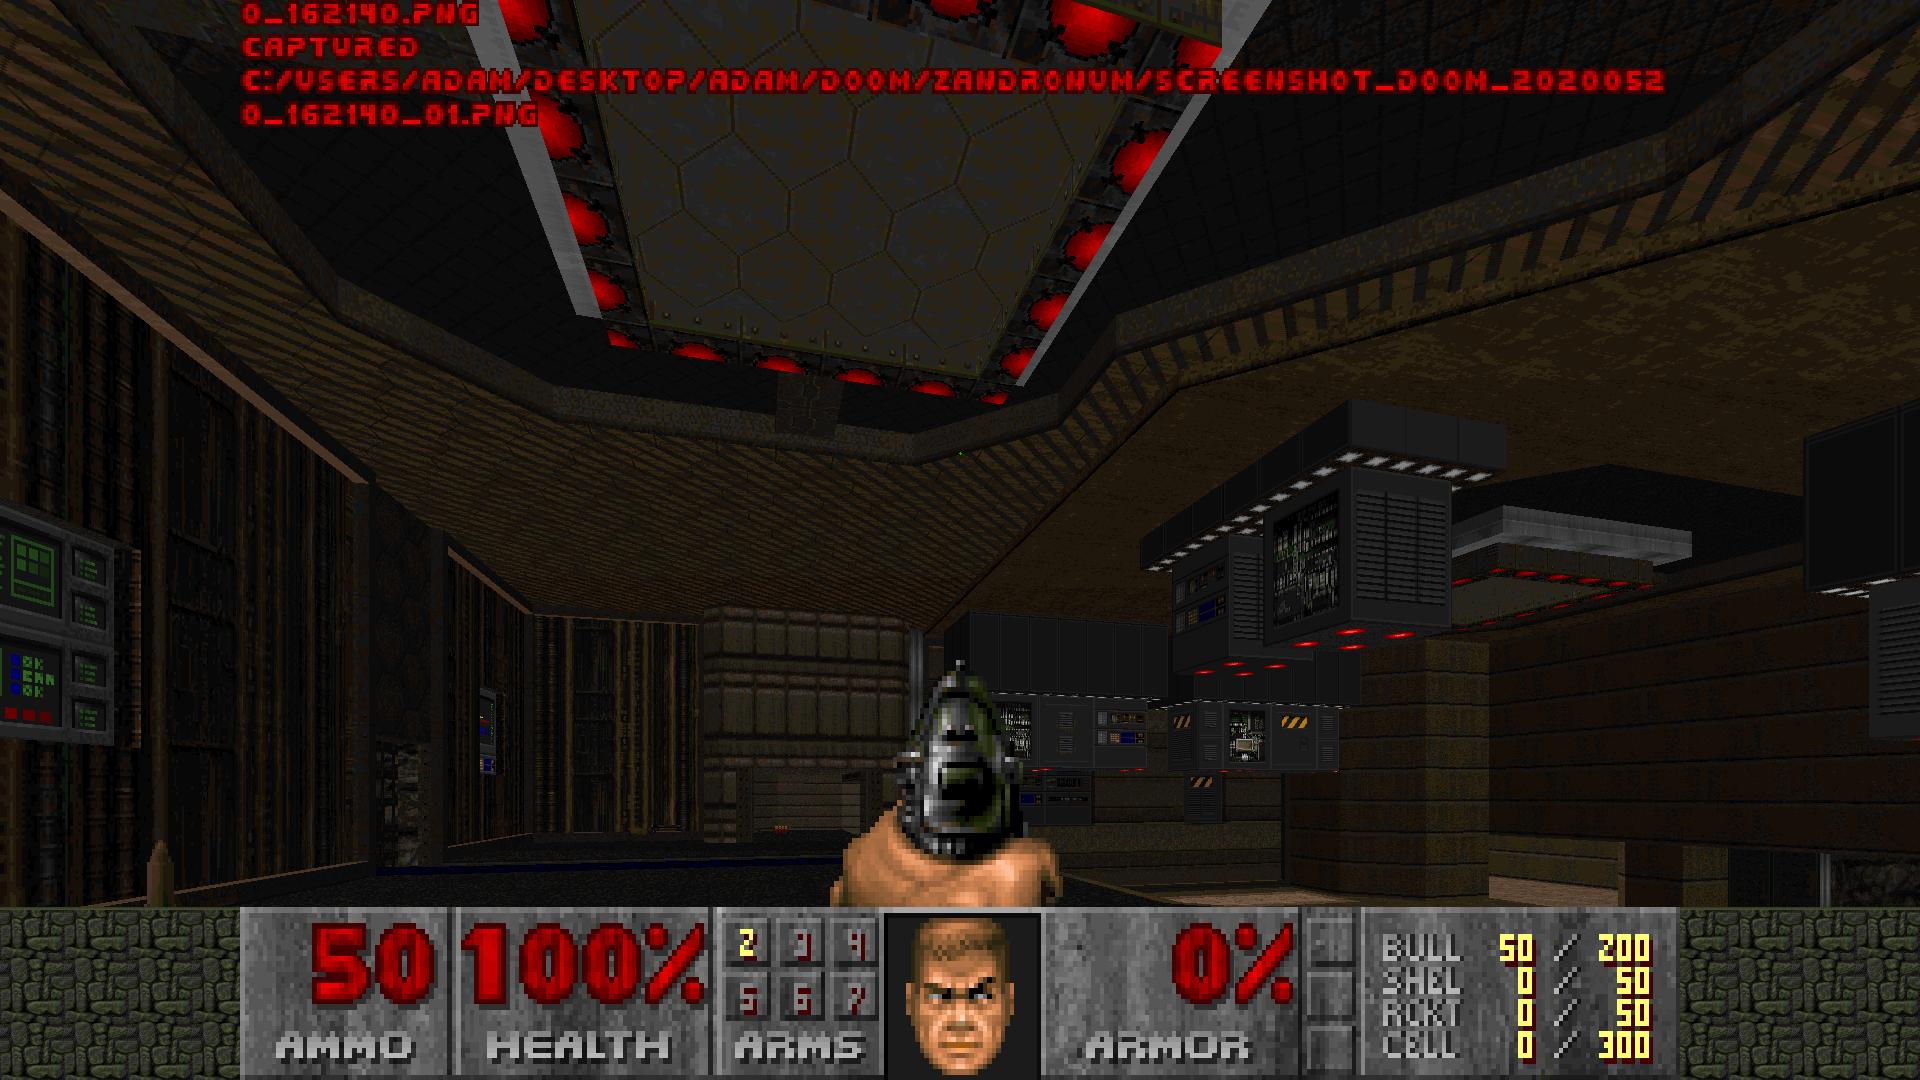 Screenshot_Doom_20200520_162141.png.72e124571eb440a8a79b5ef37e60c467.png